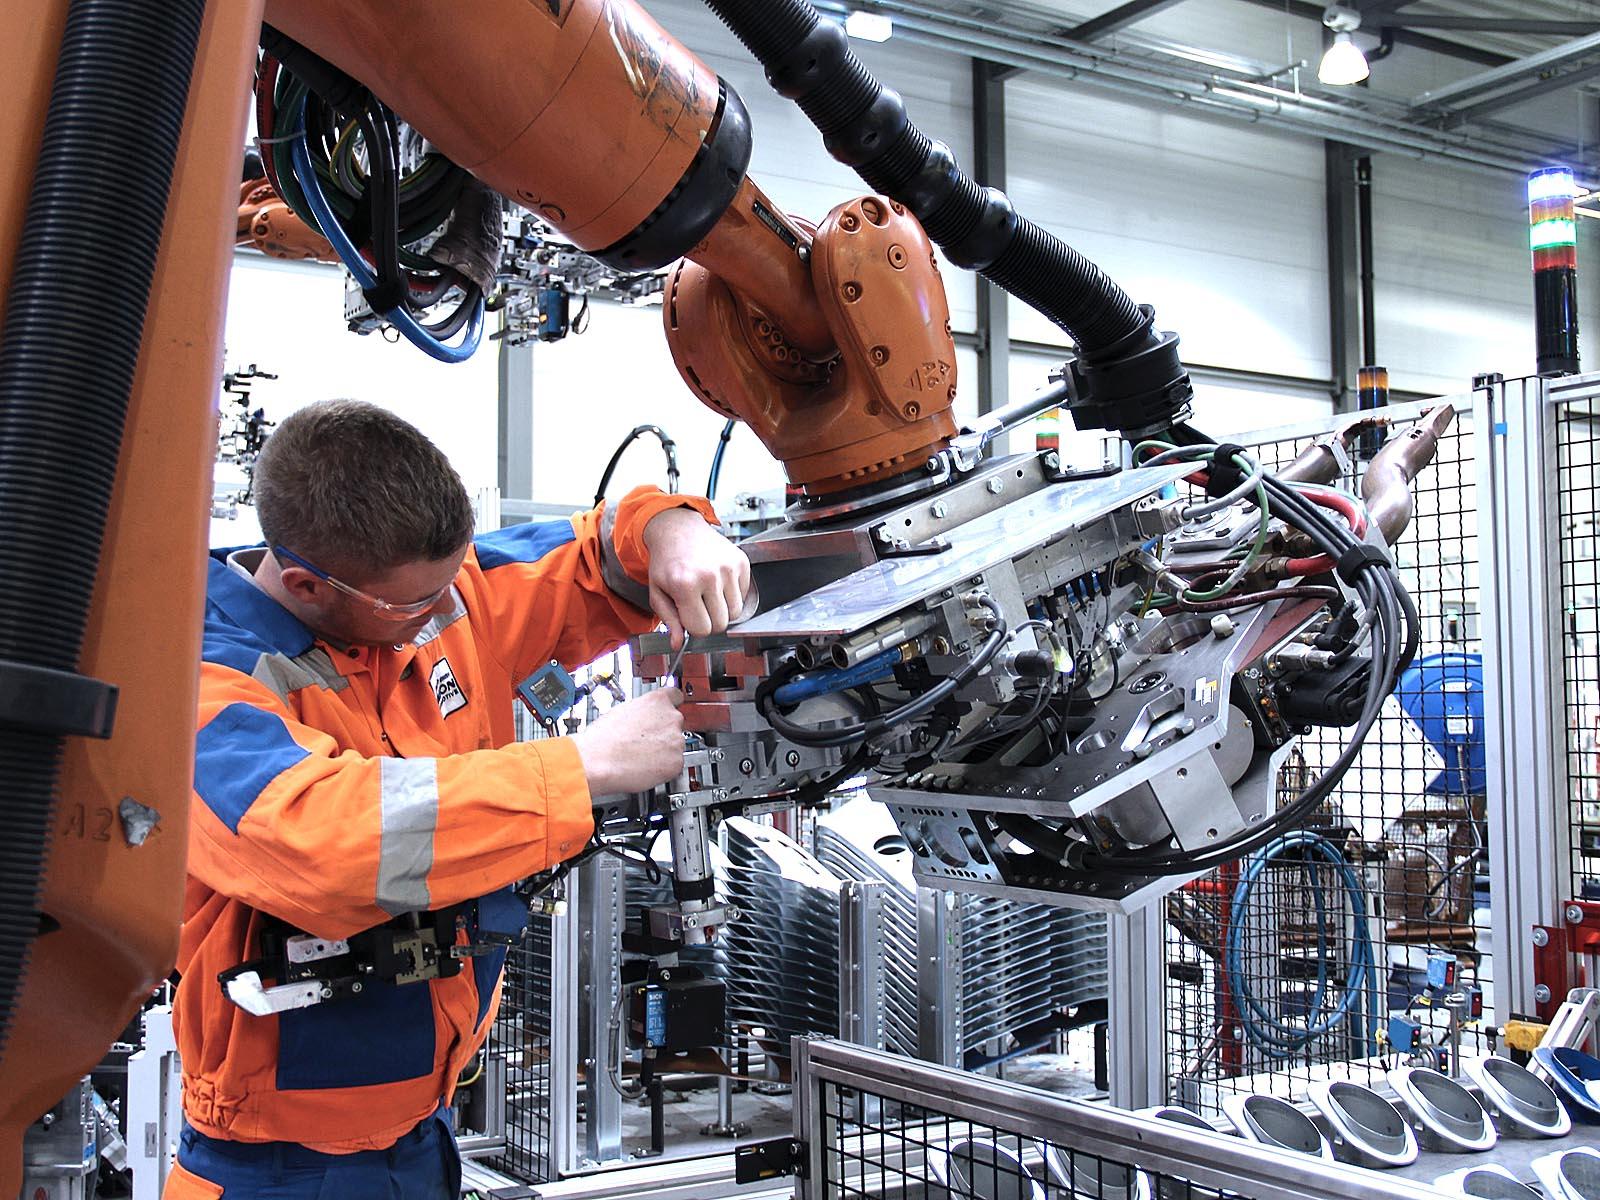 Industriemechanicker